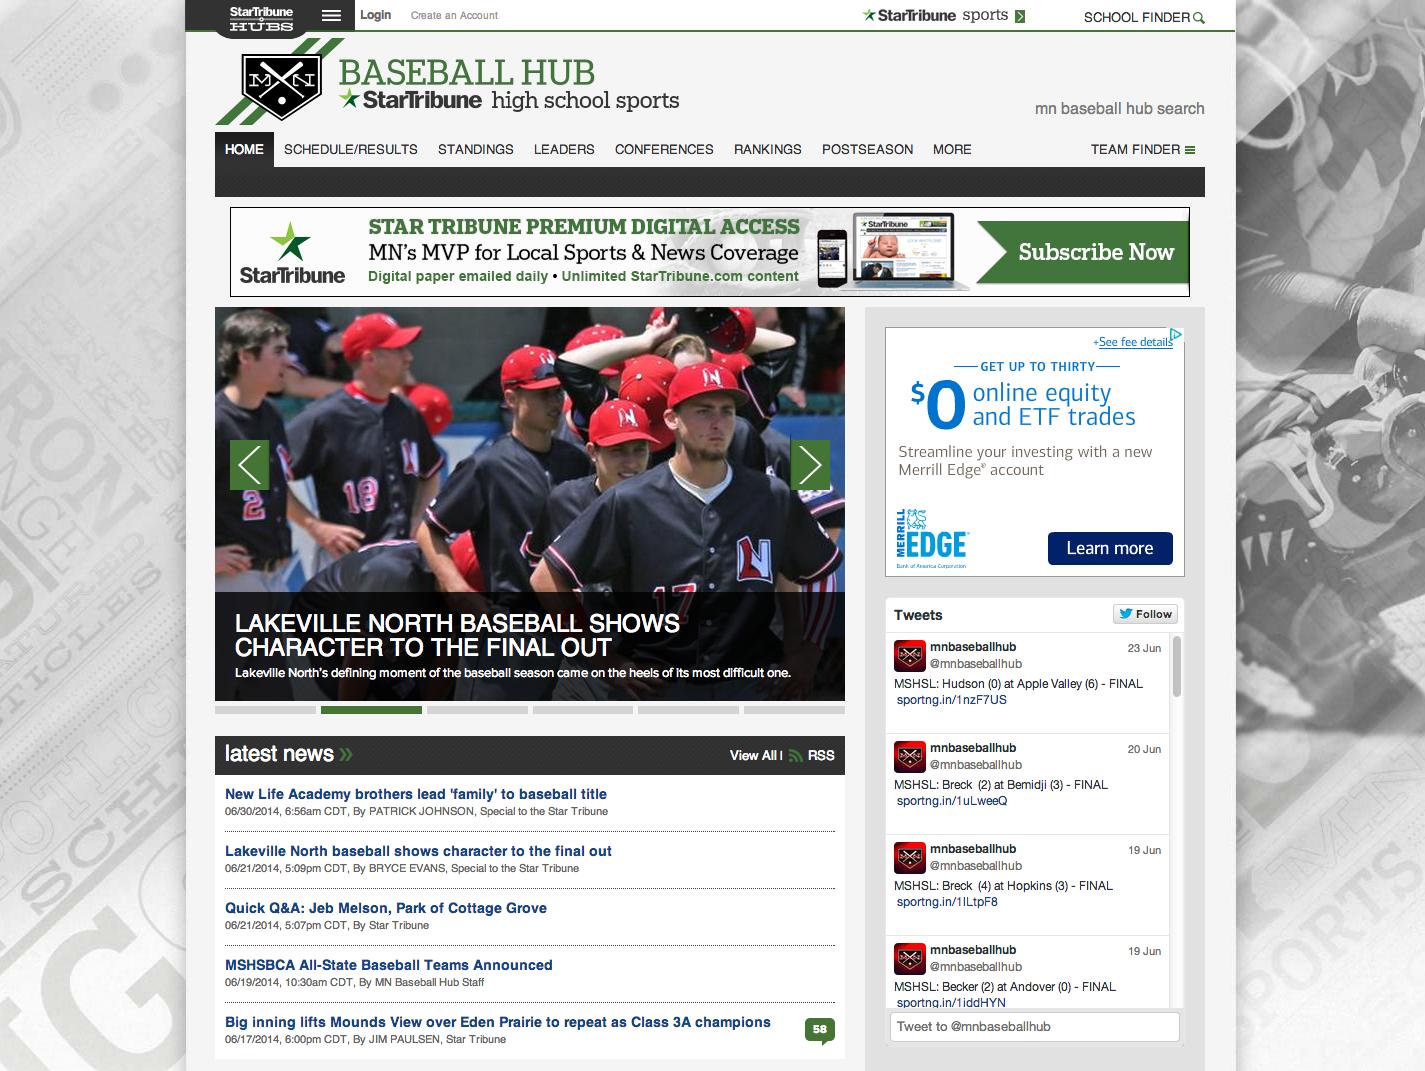 MN Baseball Hub